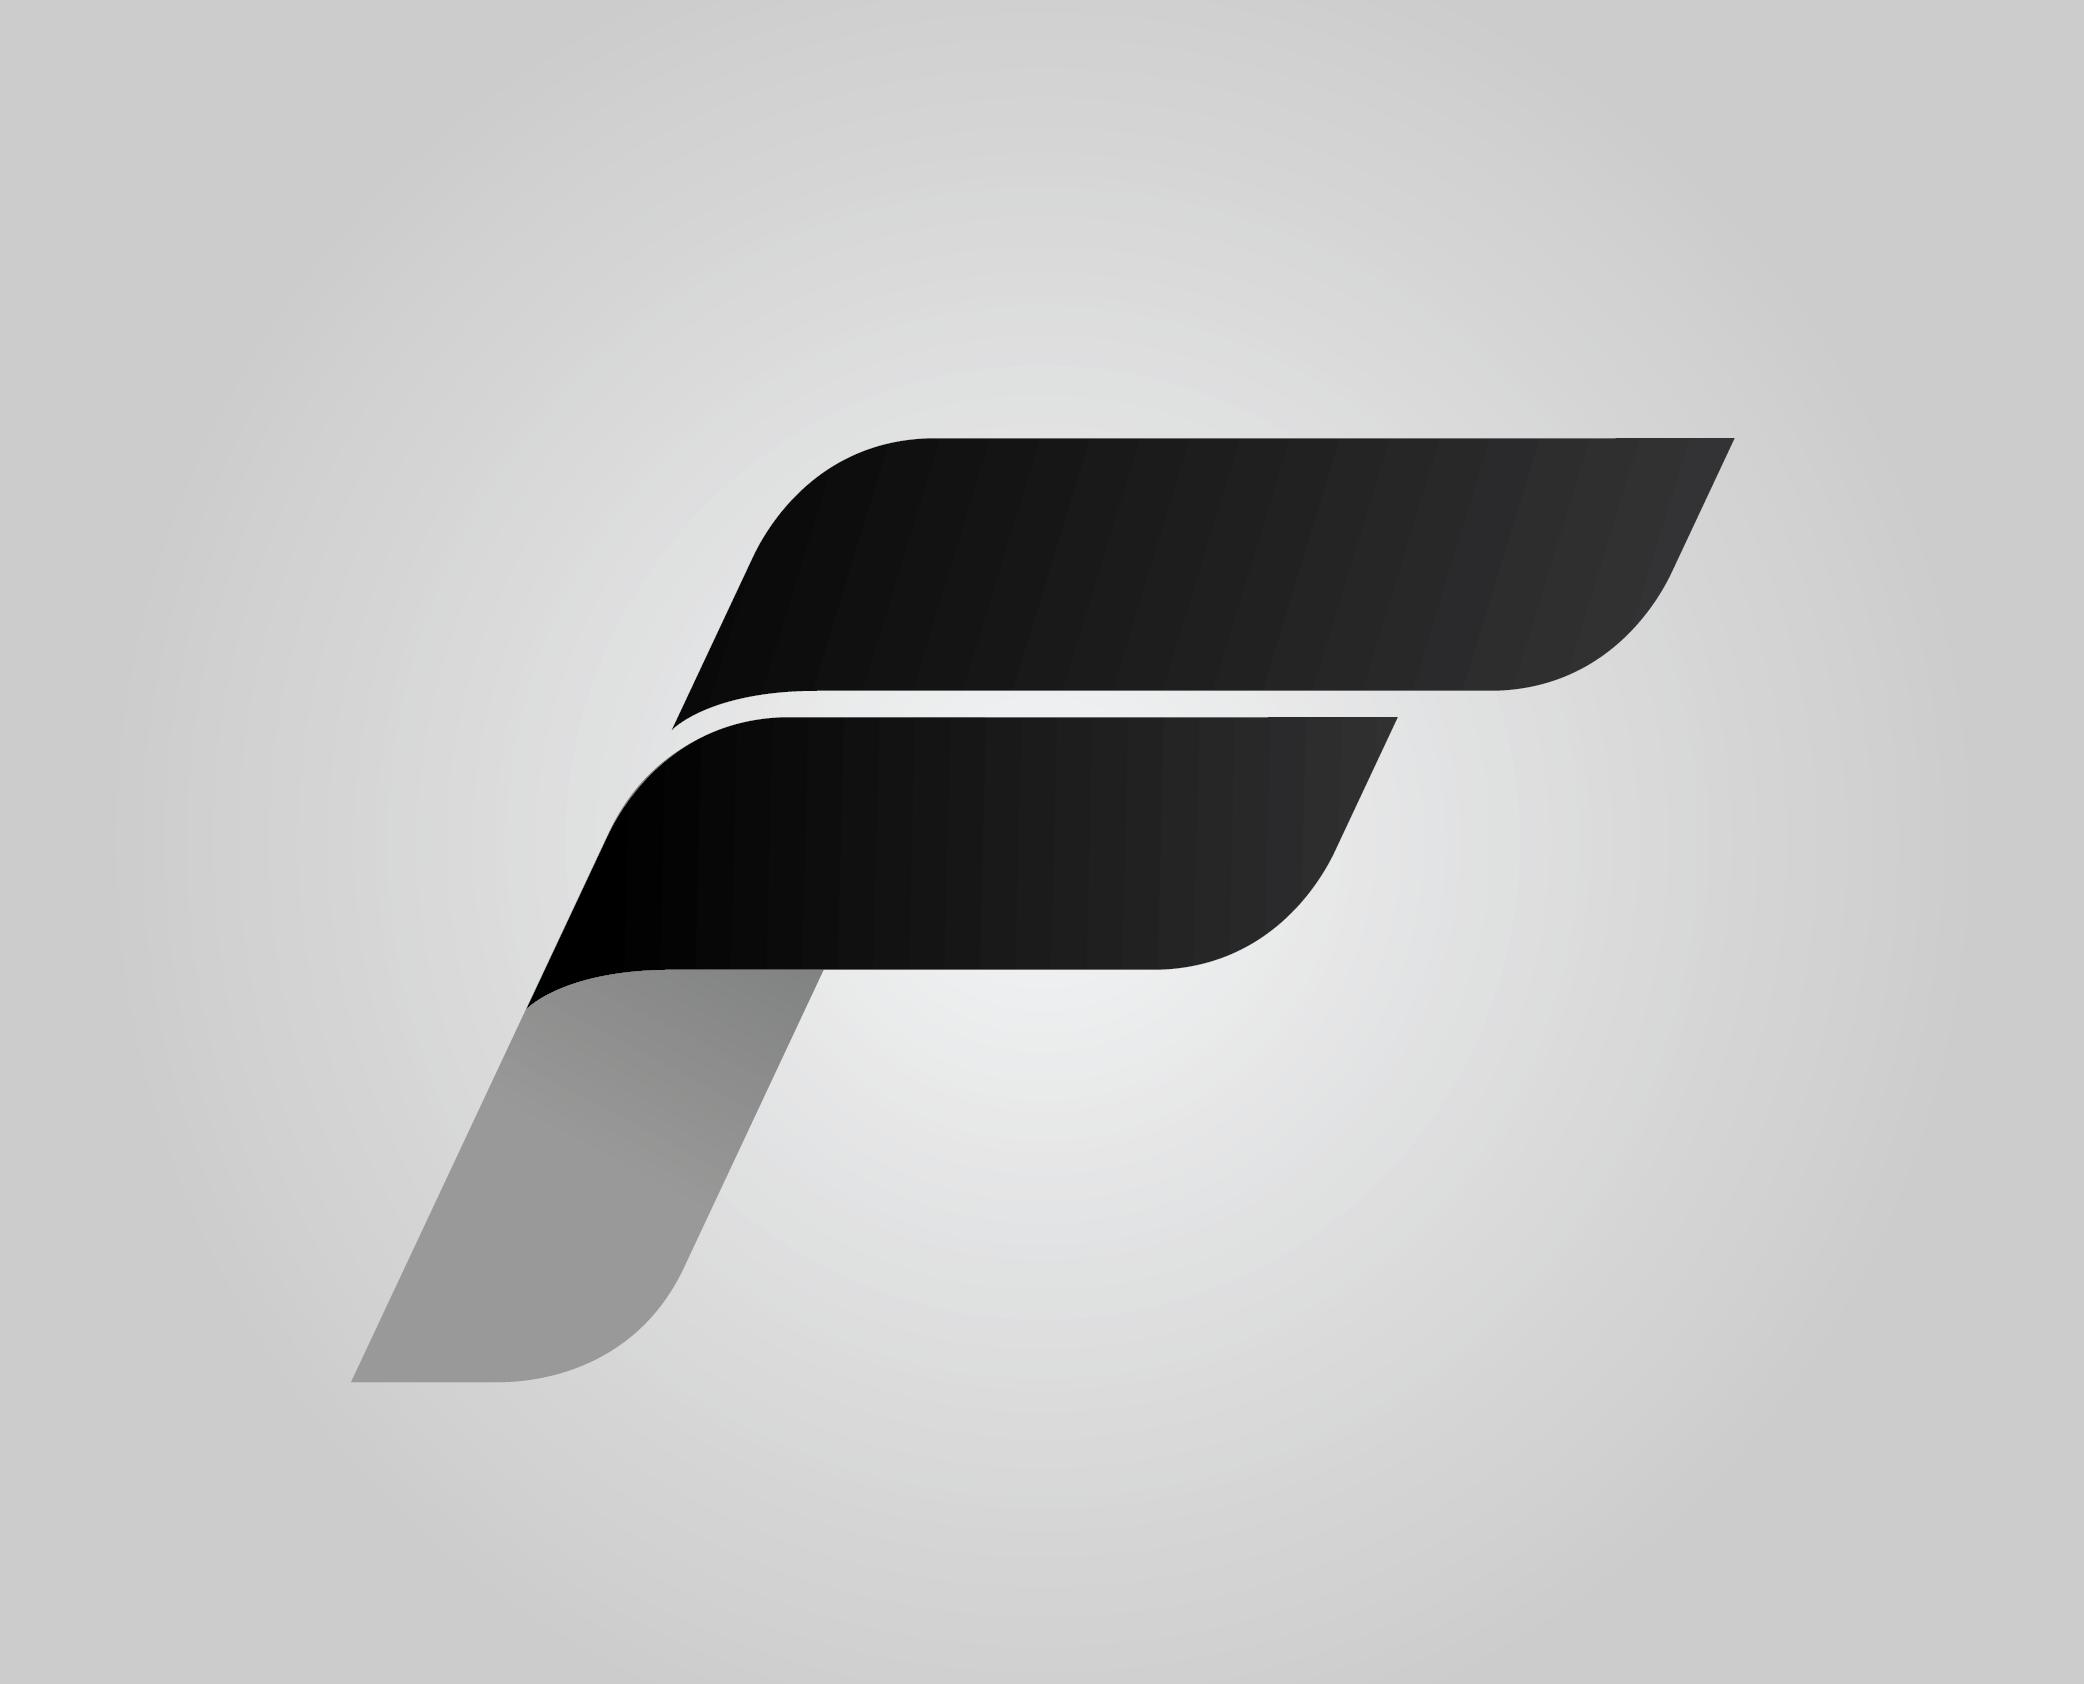 Futr_forWeb-05.png